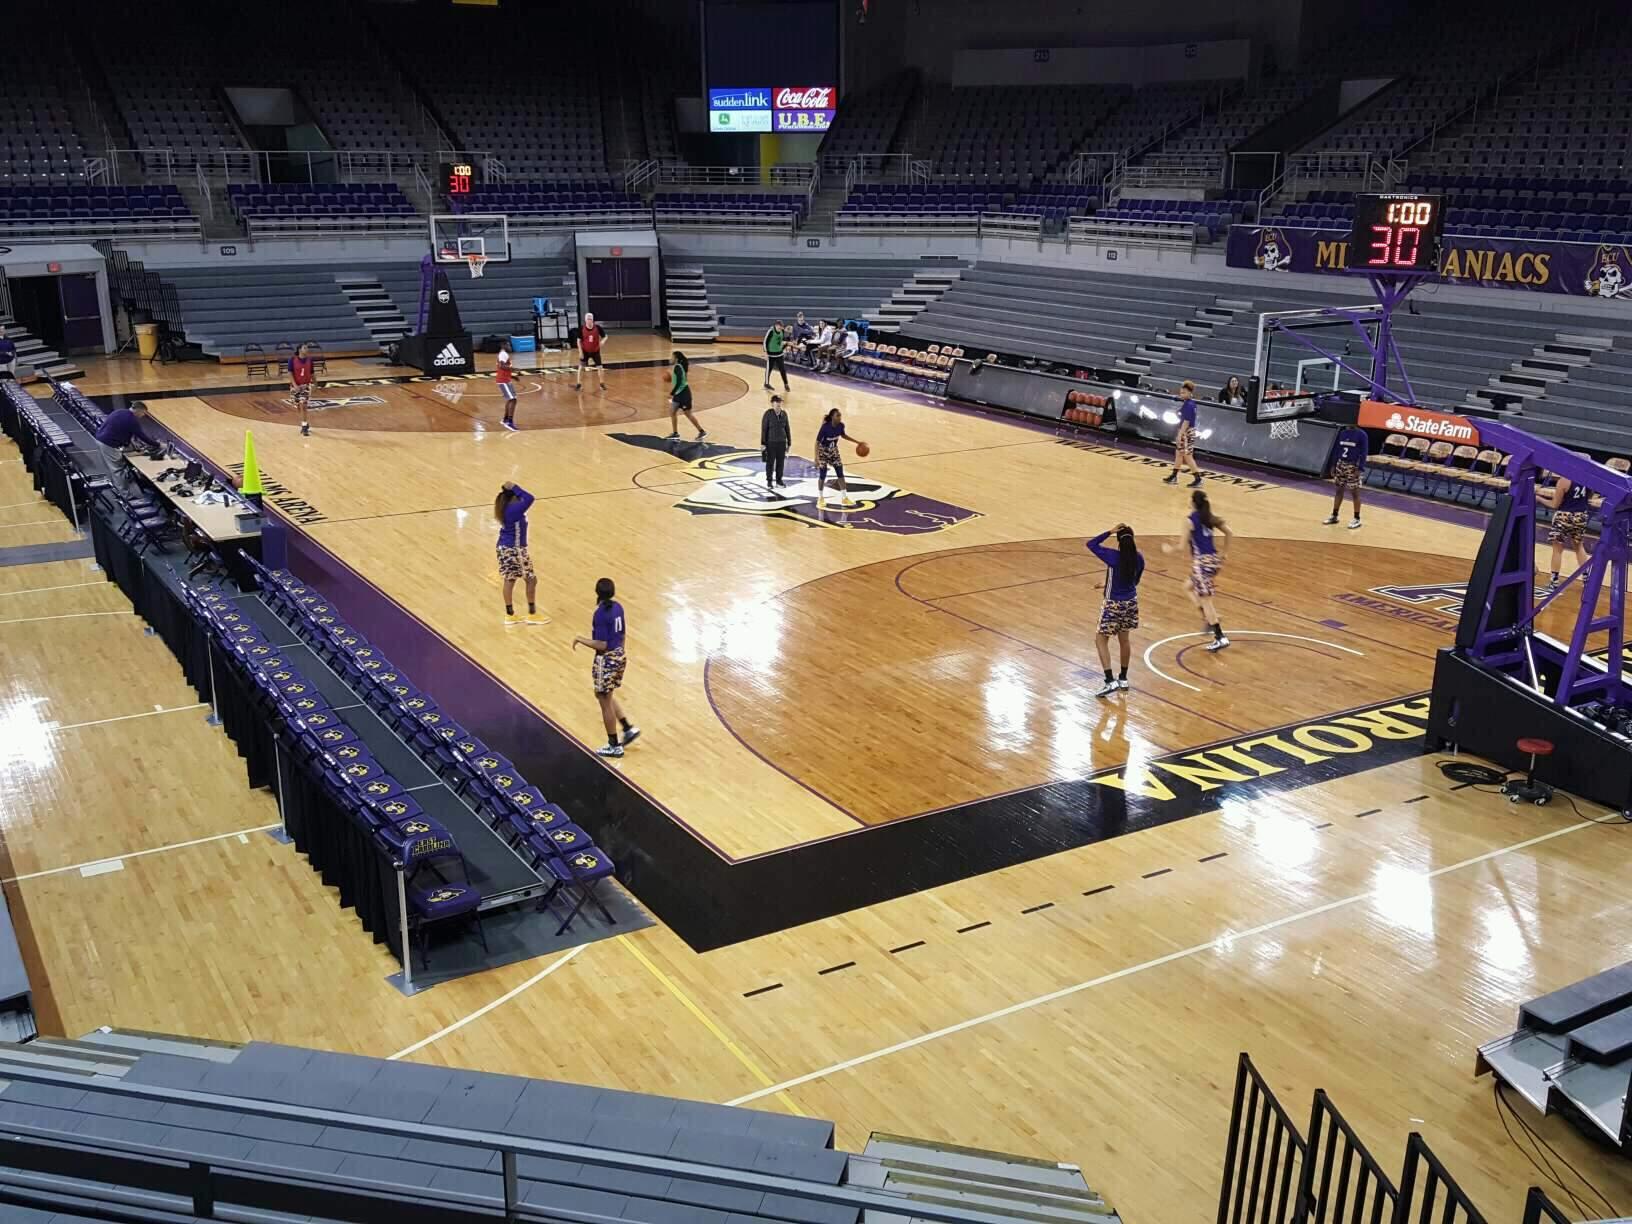 Williams Arena at Minges Coliseum Section 205 Row ADA Seat 1-8